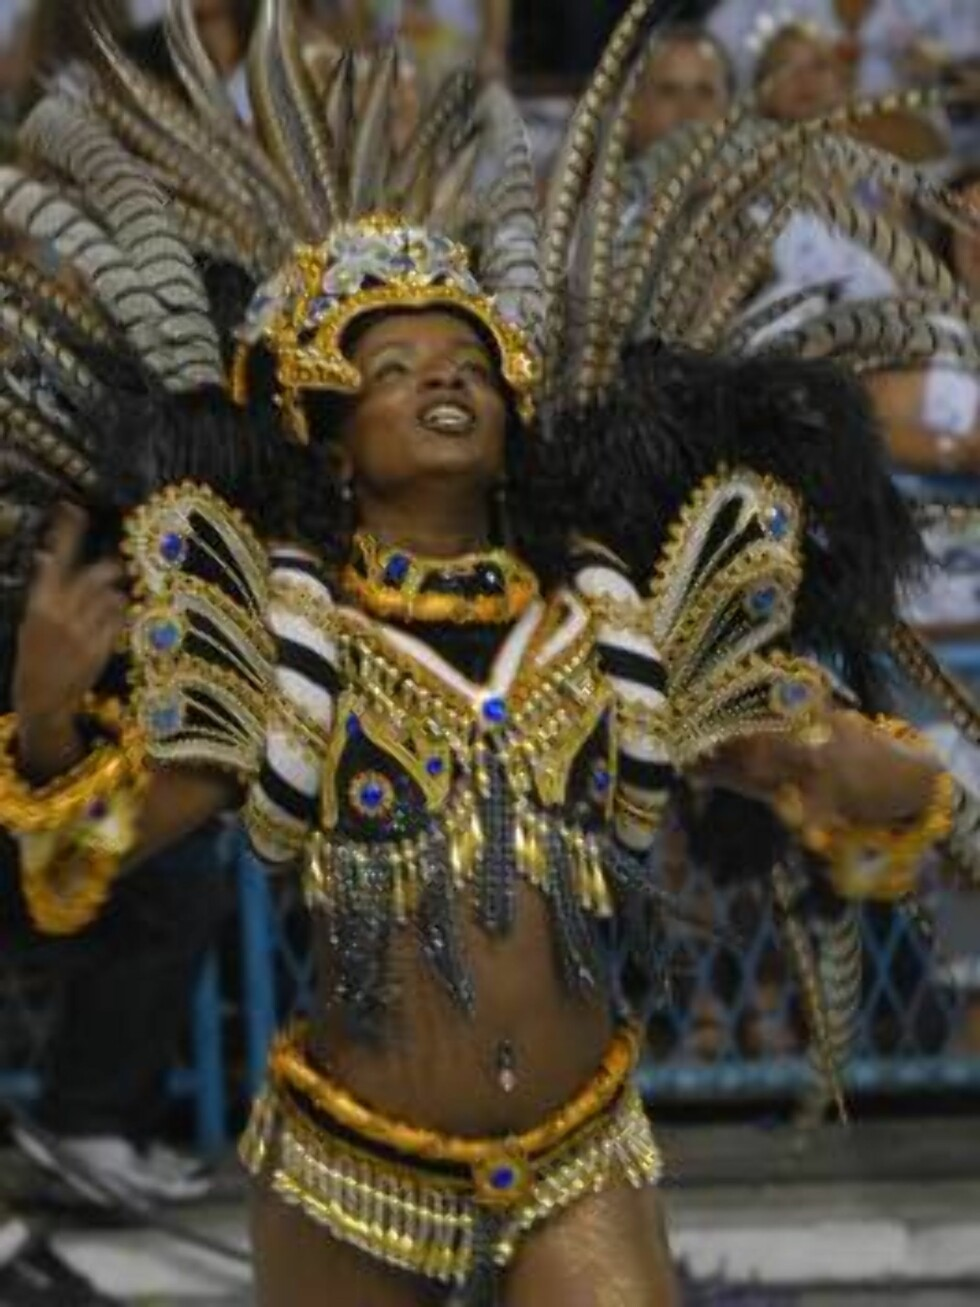 20070218: RIO DE JANEIRO, BRAZIL: Carnival Parades 2007 in Rio de Janeiro Sambodromo. PIctured here Unidos de Vila Isabel Samba School.  PHOTO: BRAINPIX Code: 4027  COPYRIGHT STELLA  PICTURES Foto: Stella Pictures